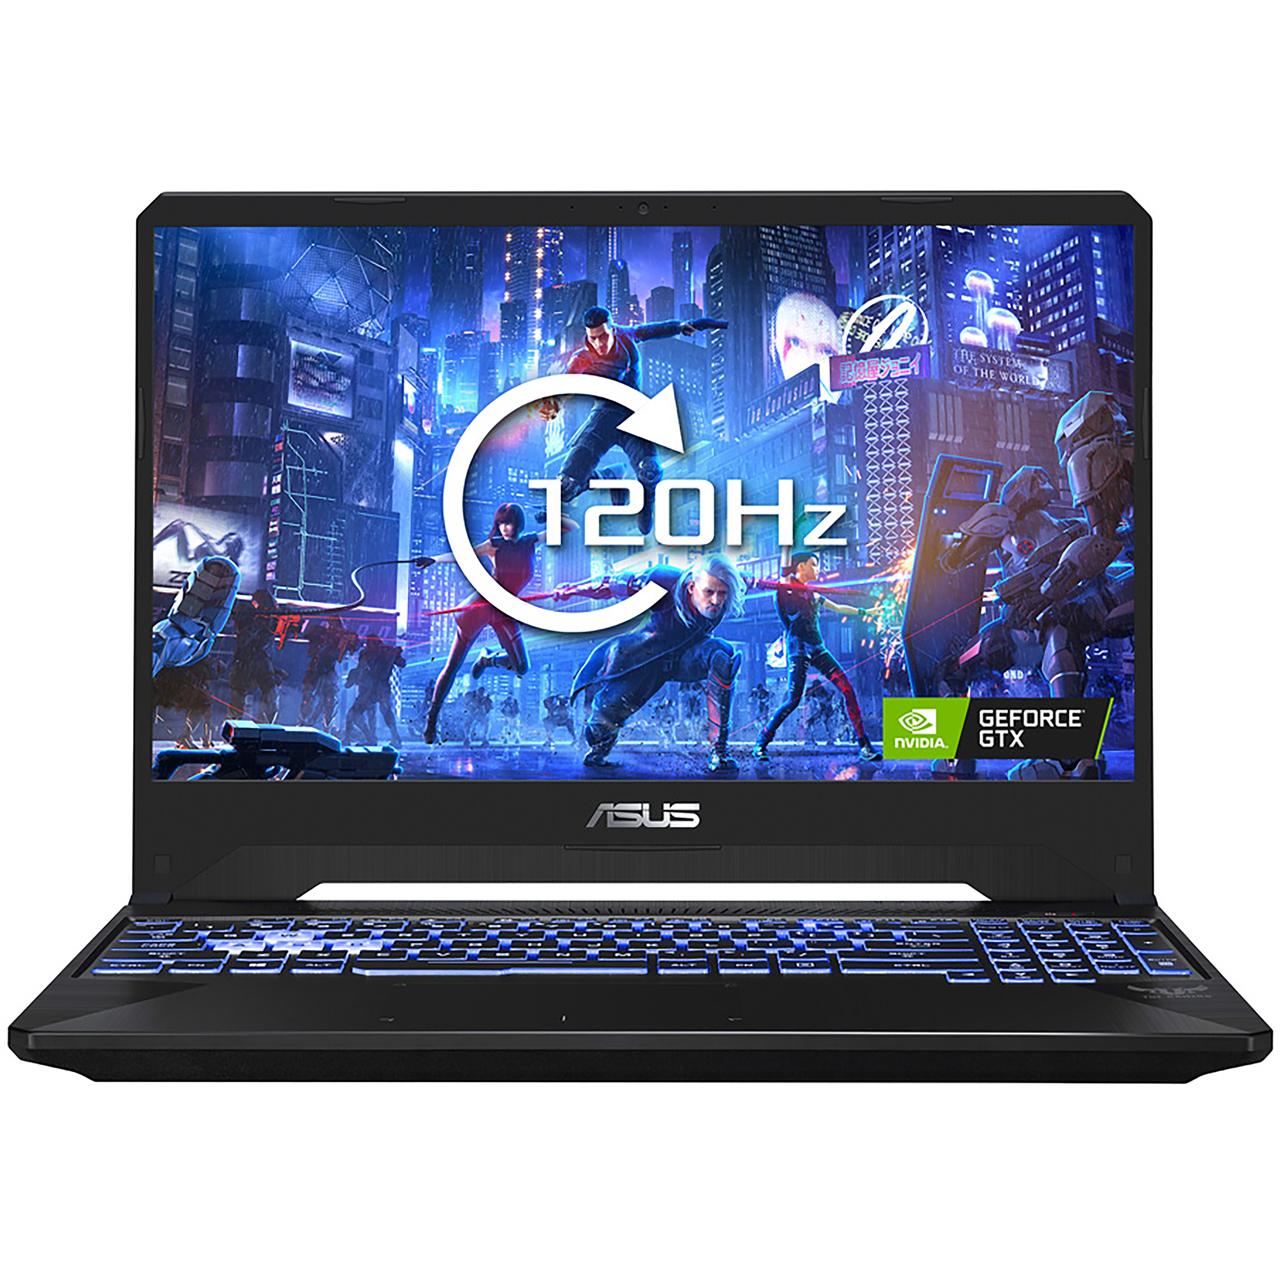 "Asus TUF FX505DT 15.6"" Gaming Laptop - Blue £647.10 @ AO"